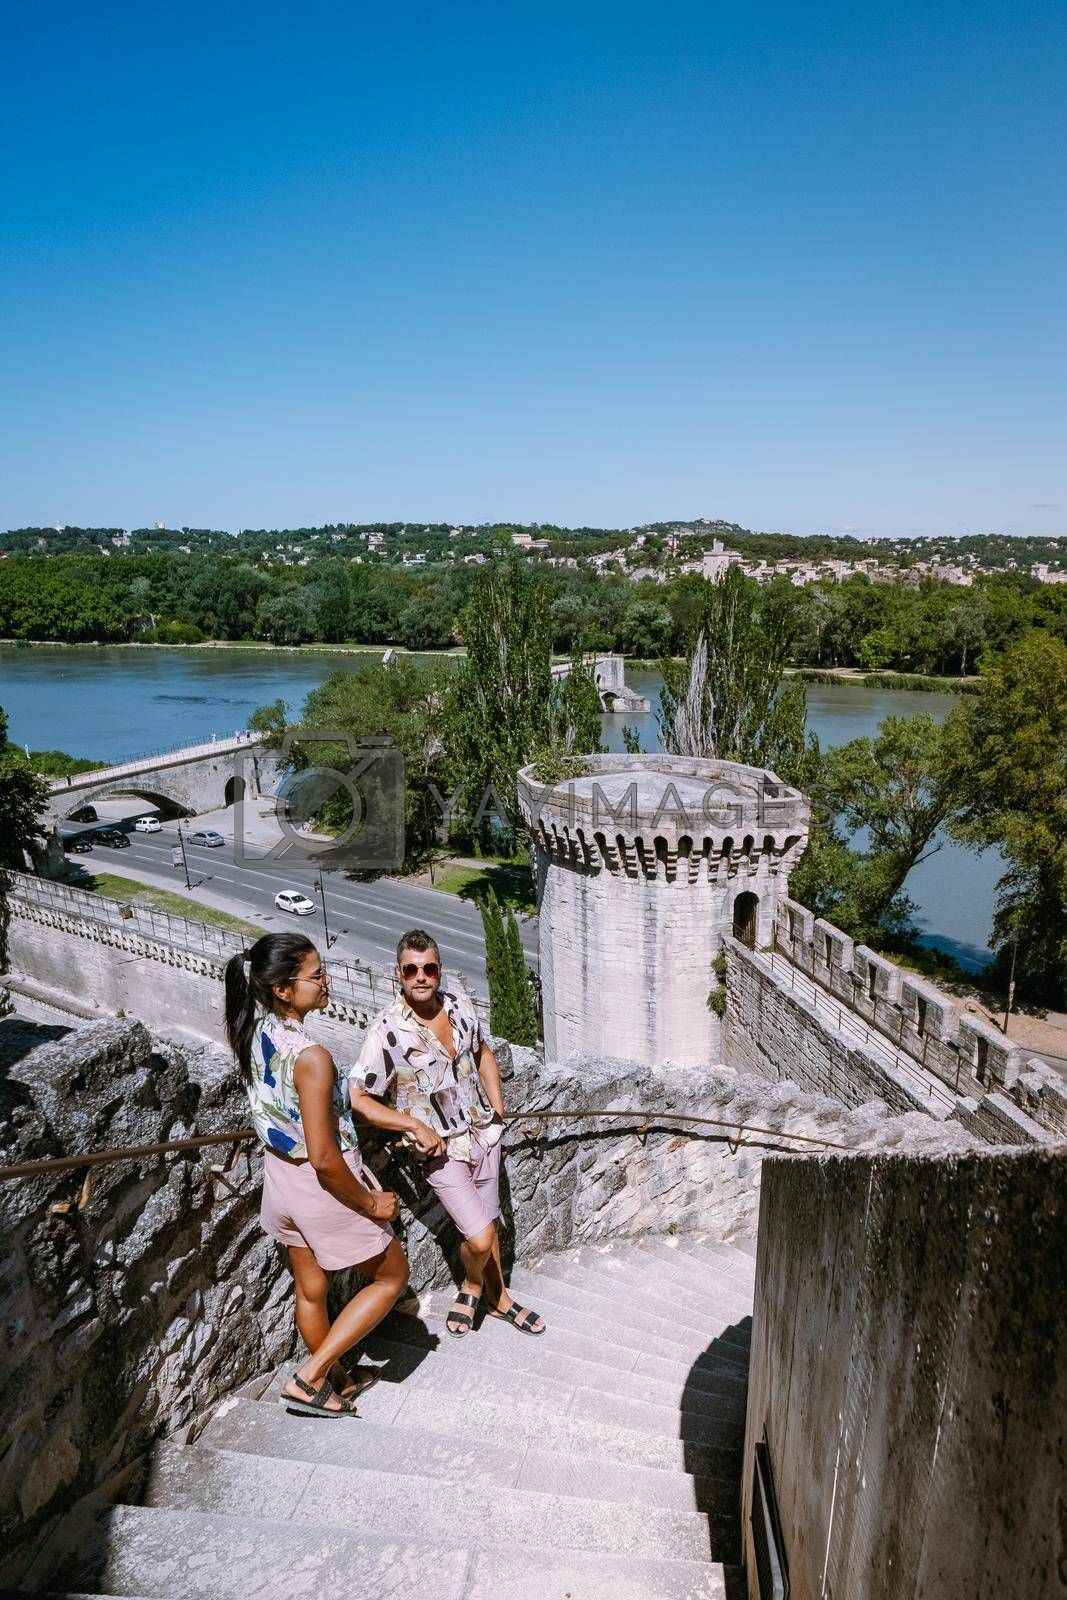 couple city trip Avignon Southern France, Ancient Popes Palace, Saint-Benezet, Avignon, Provence, France Europe